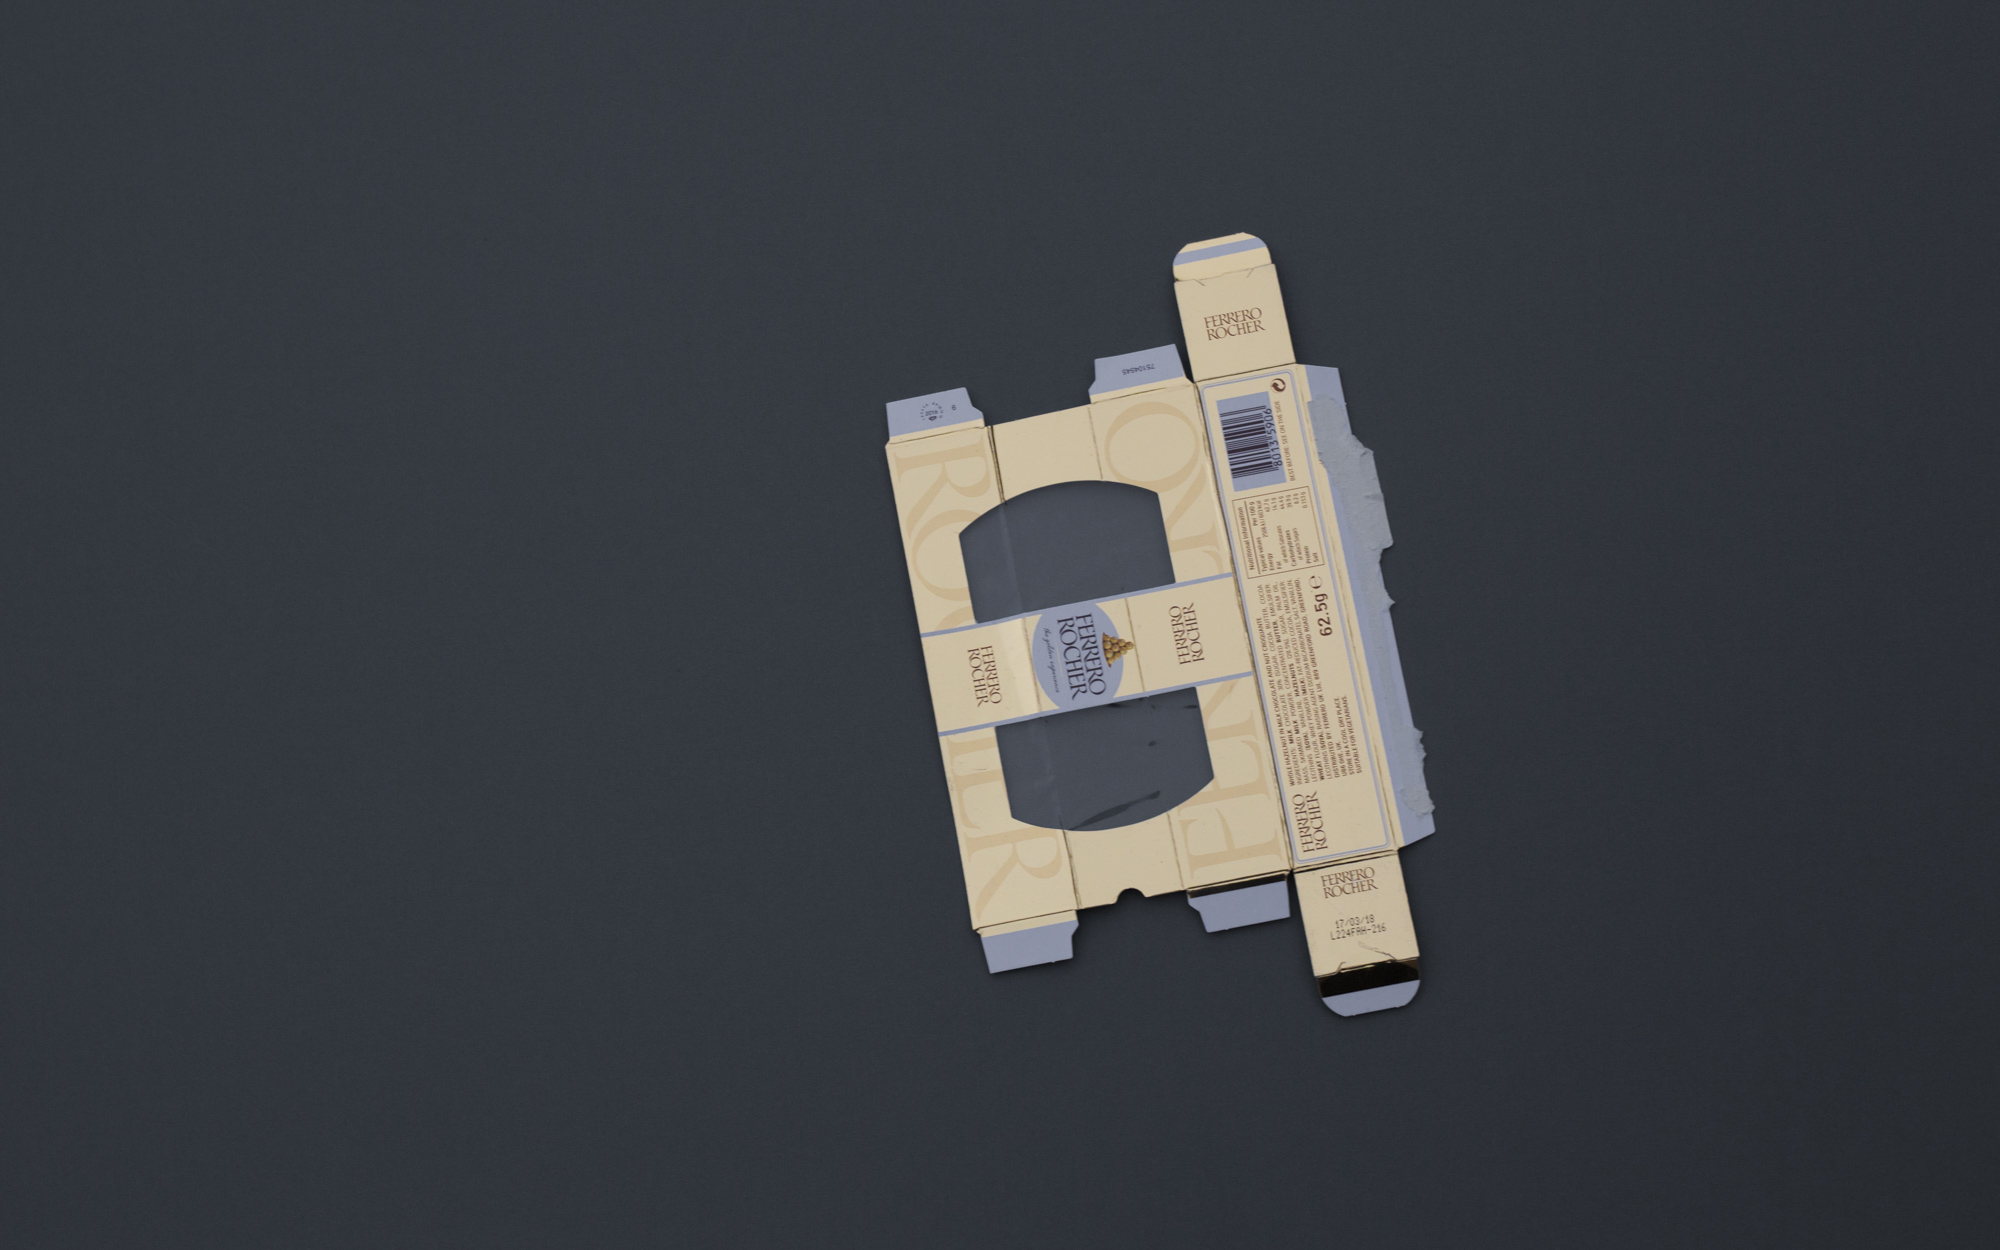 Unwrapped-33.jpg